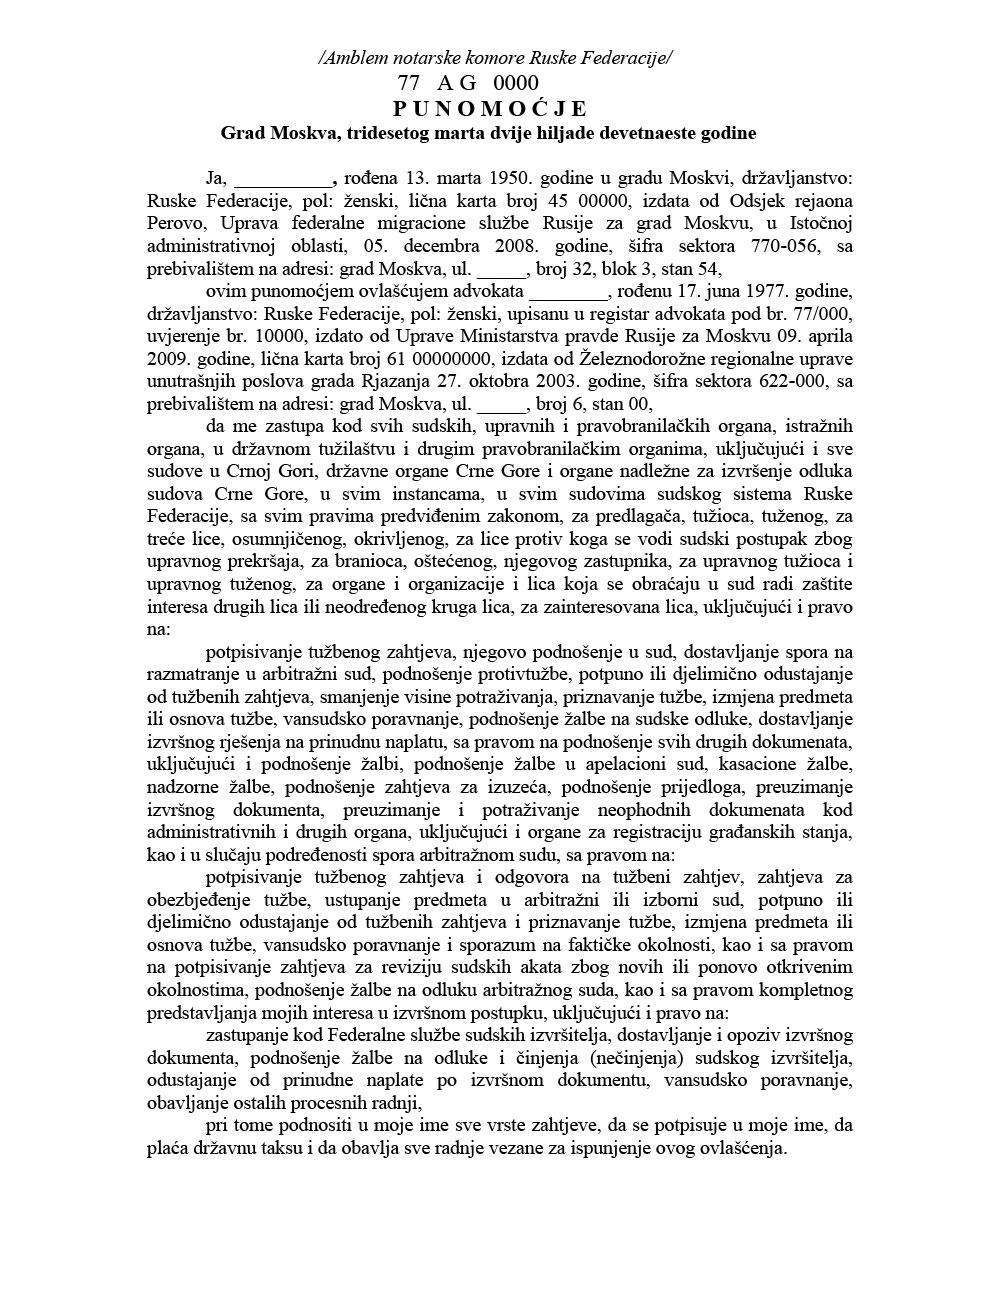 Пример перевода доверенности на сербский